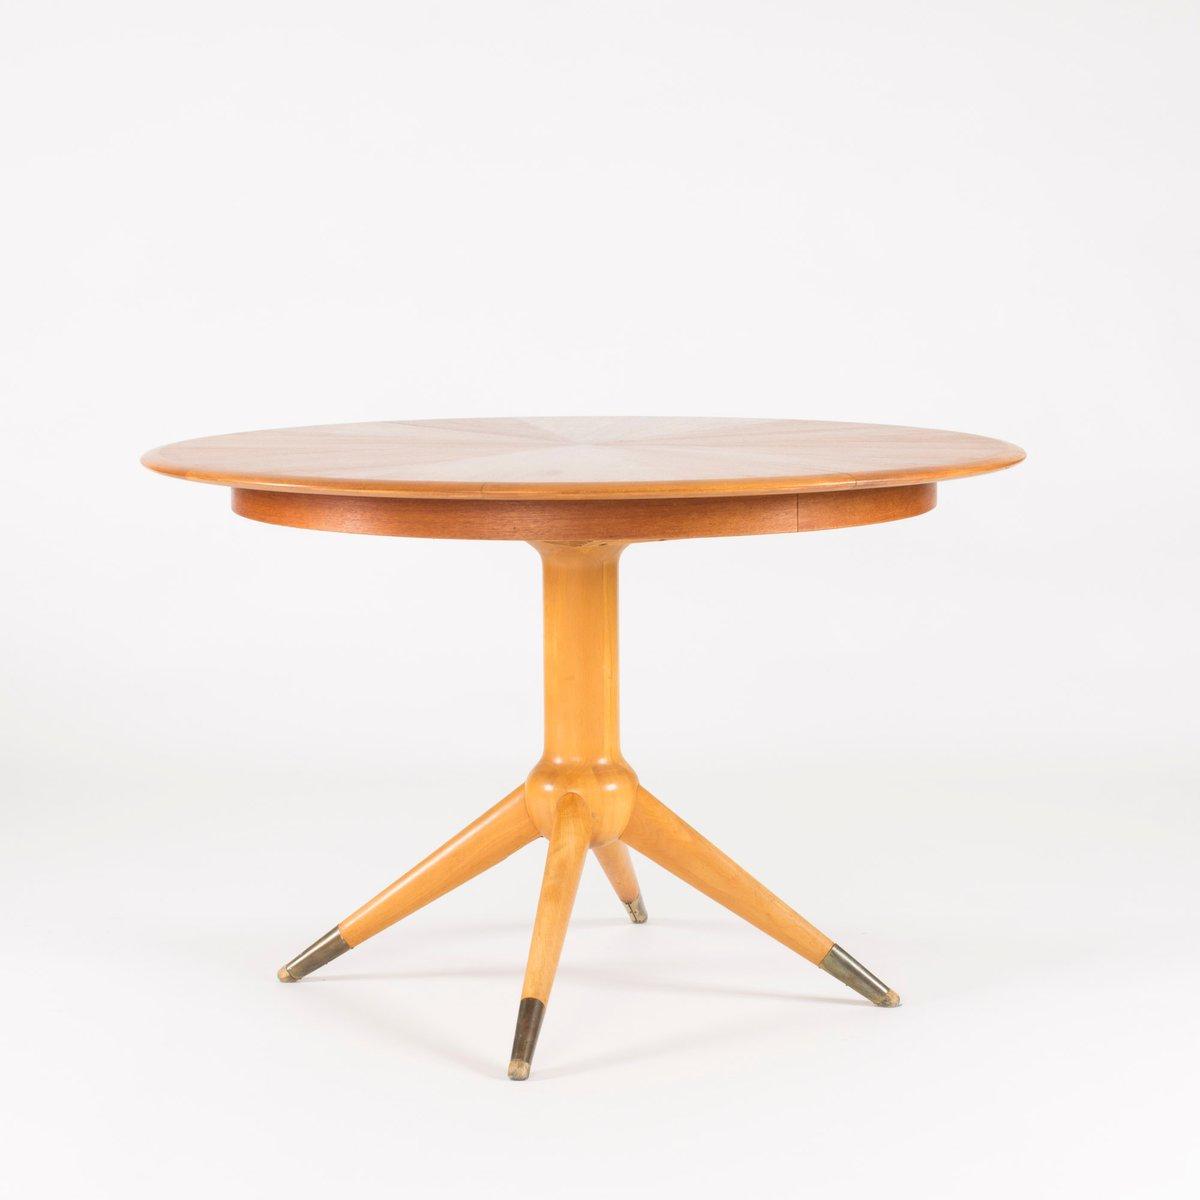 Round Teak Veneer Dining Table by David Ros233n for Nordiska  : round teak veneer dining table by david rosen for nordiska kompaniet 1950s 1 from www.pamono.co.uk size 1200 x 1200 jpeg 31kB